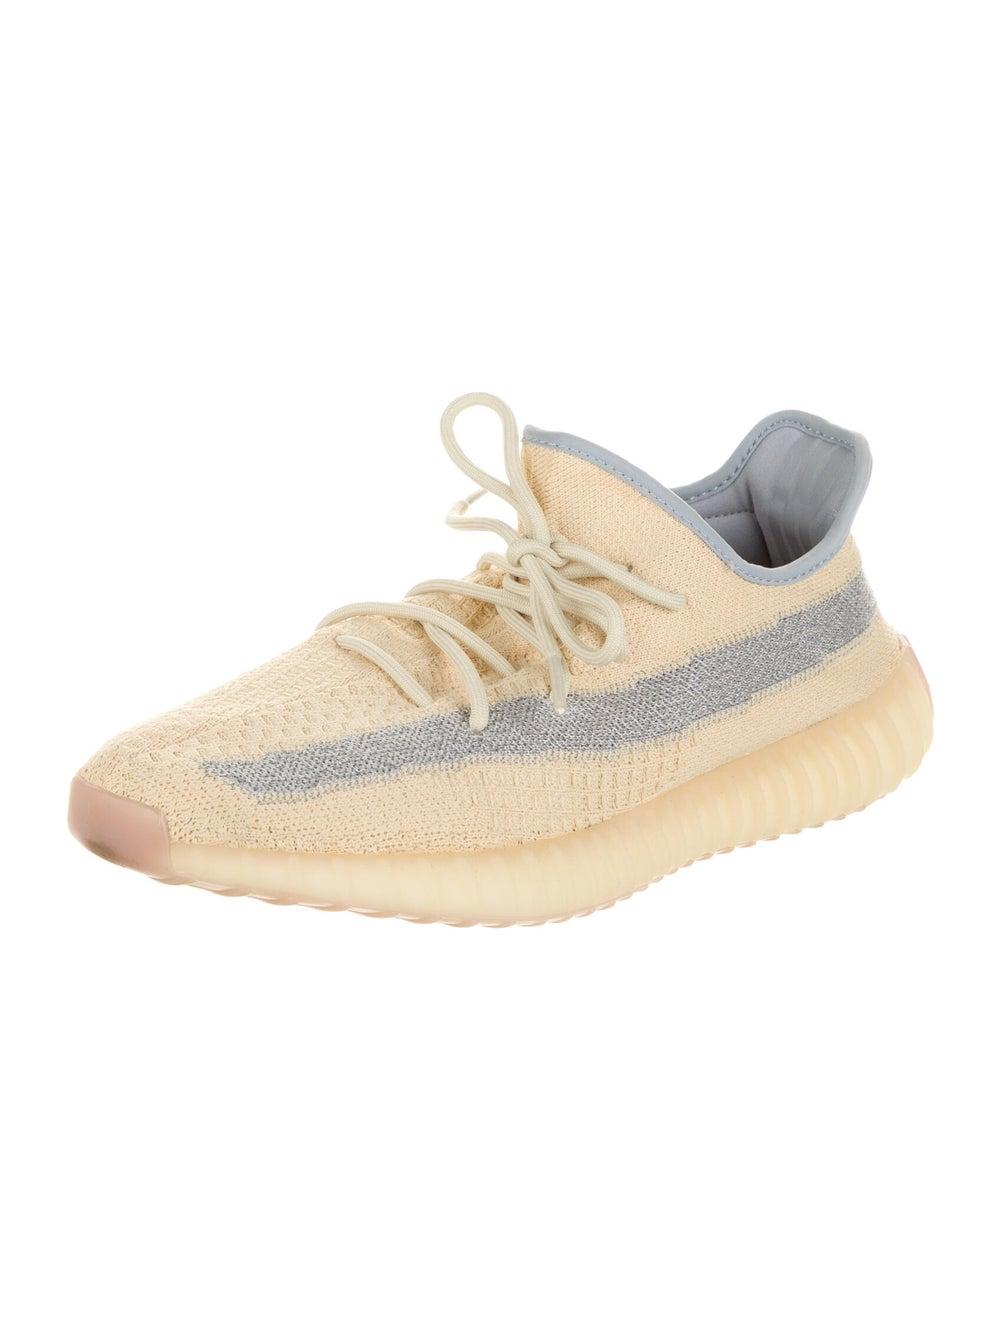 Yeezy x adidas Boost 350 V2 Linen Sneakers Sneake… - image 2